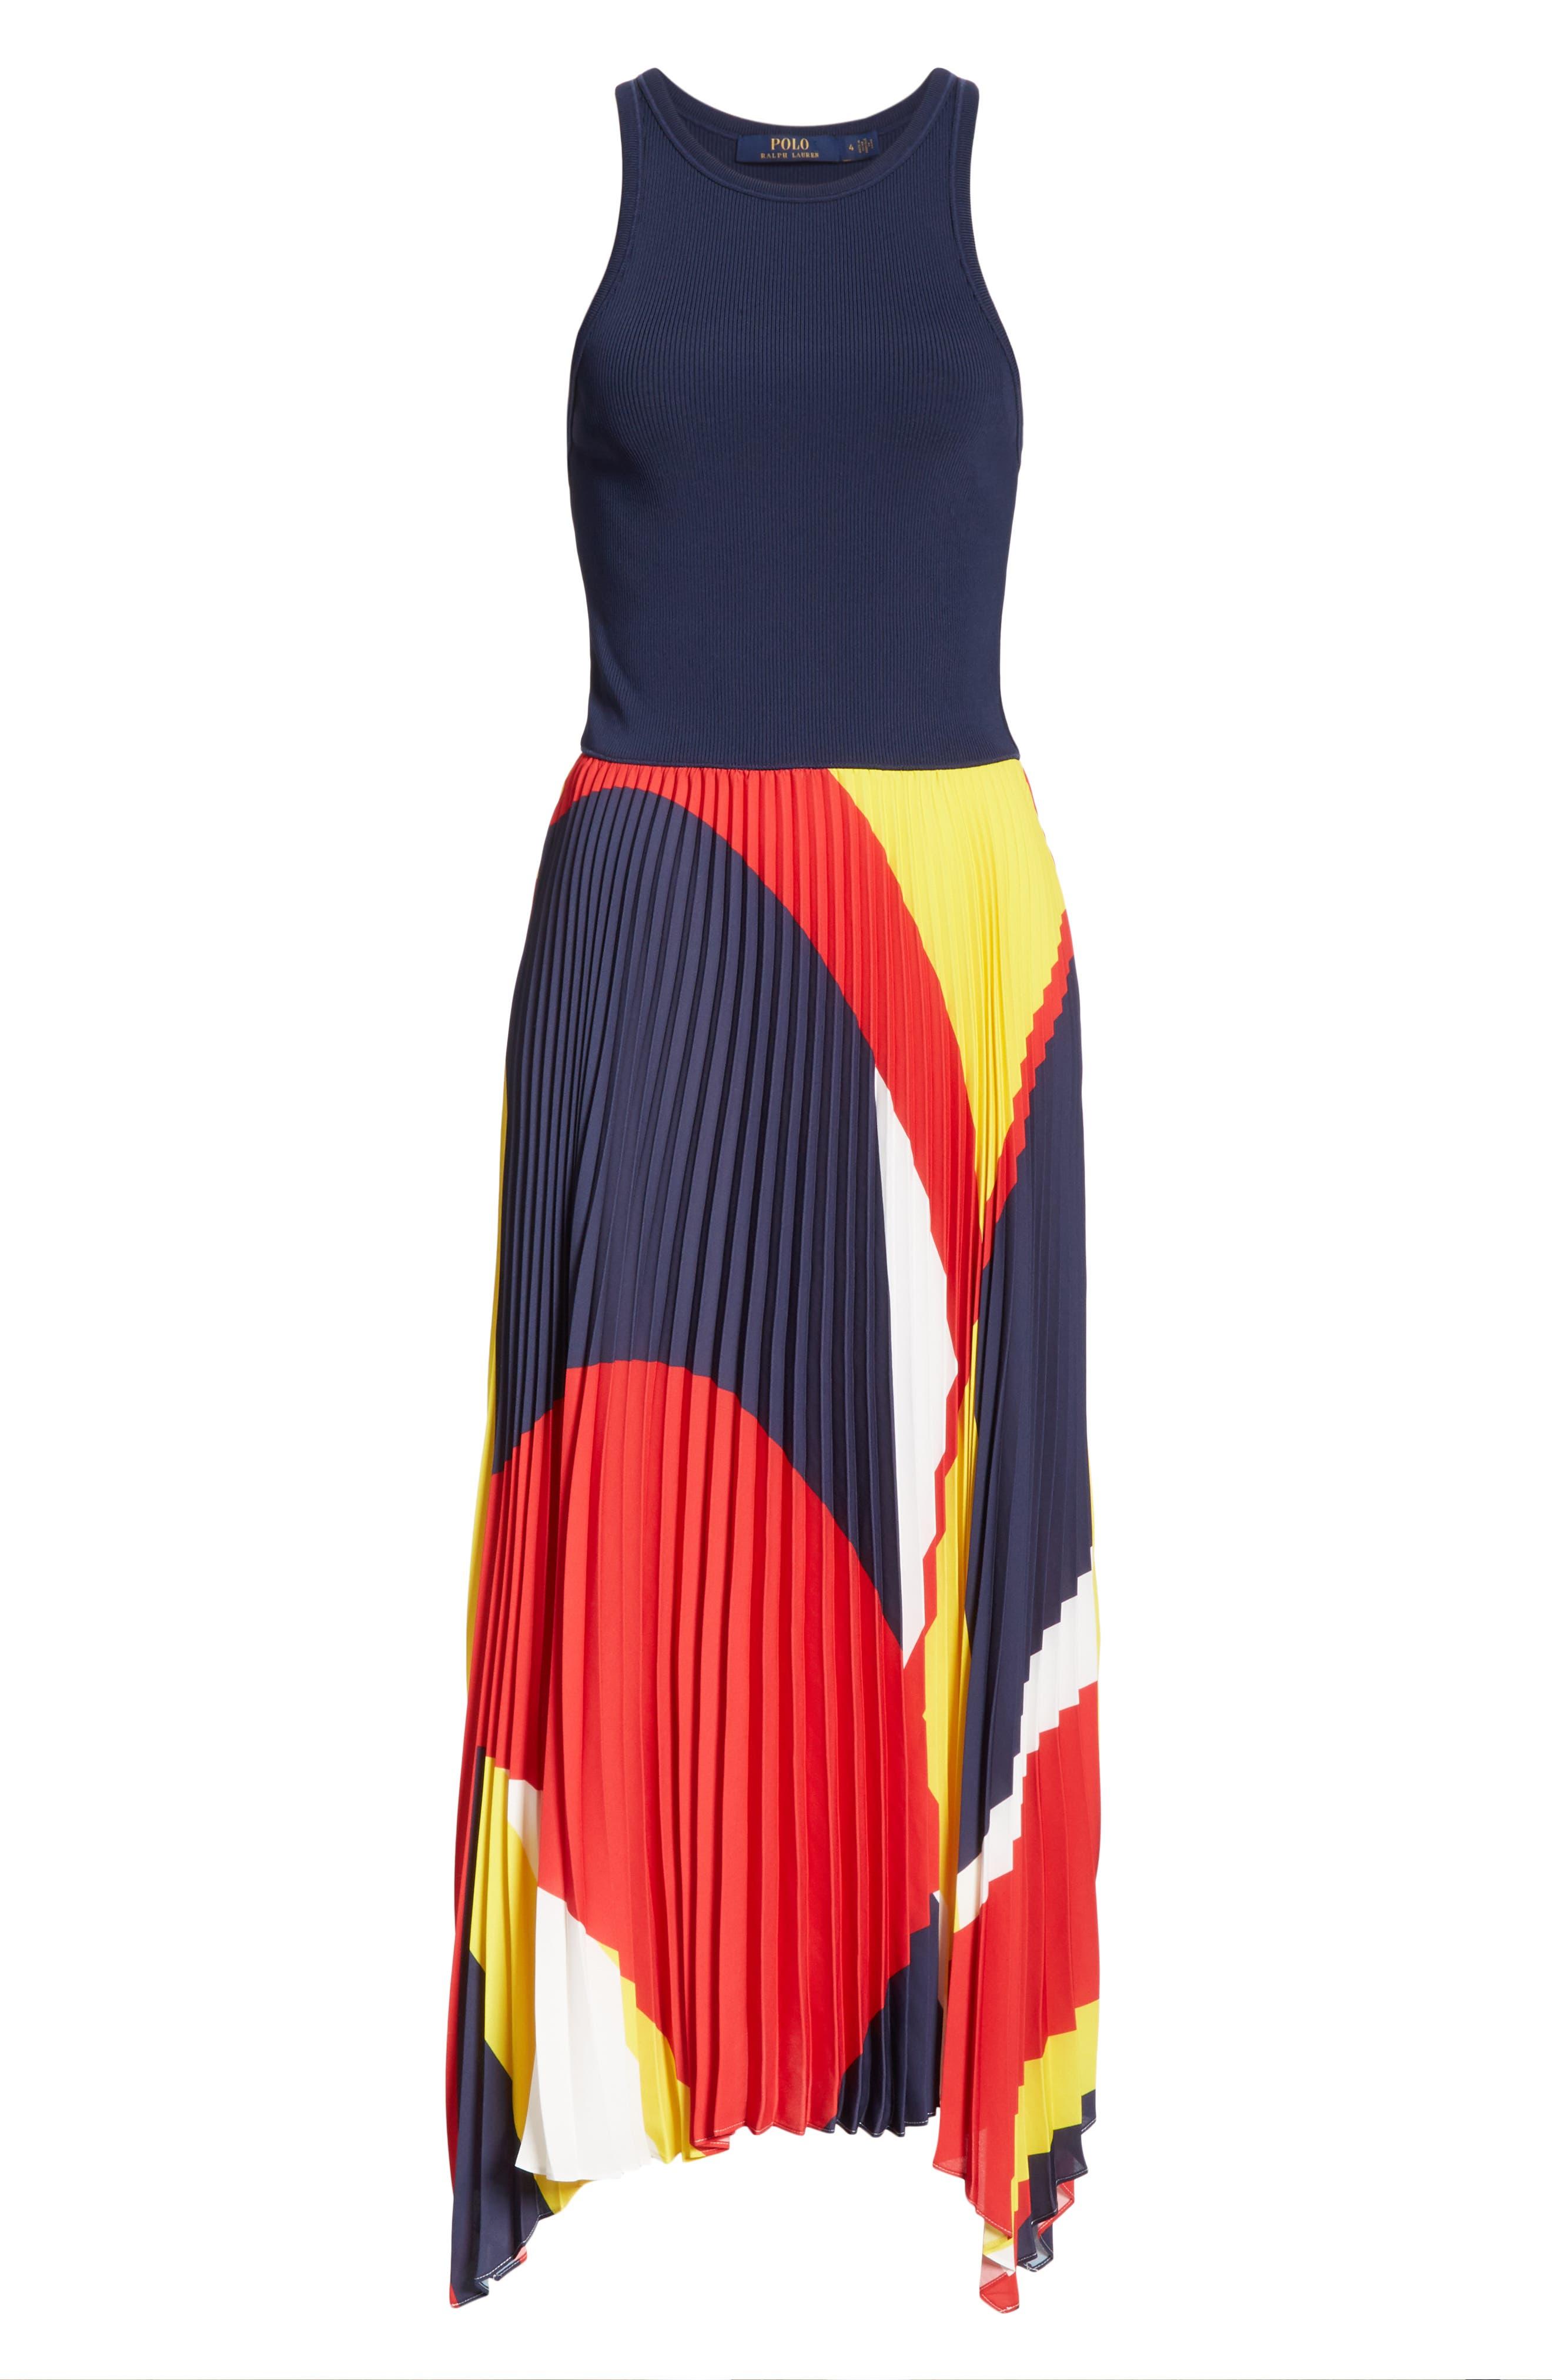 Alyah Mixed Media Dress,                             Alternate thumbnail 6, color,                             410